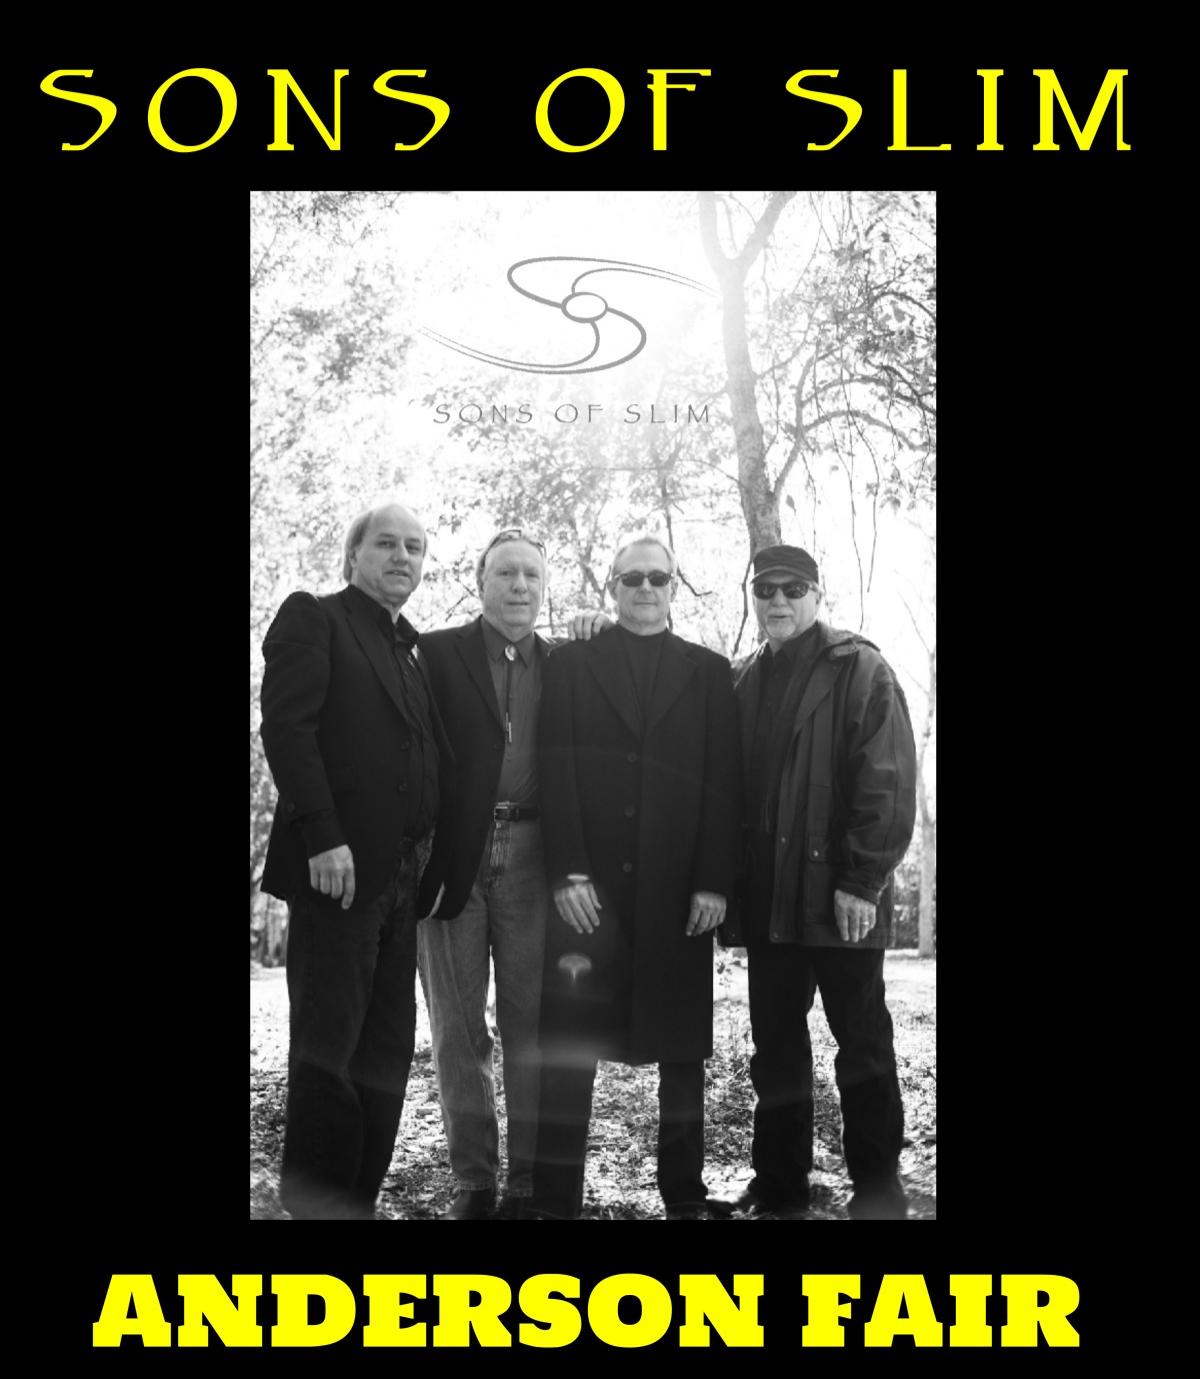 Sons of Slim